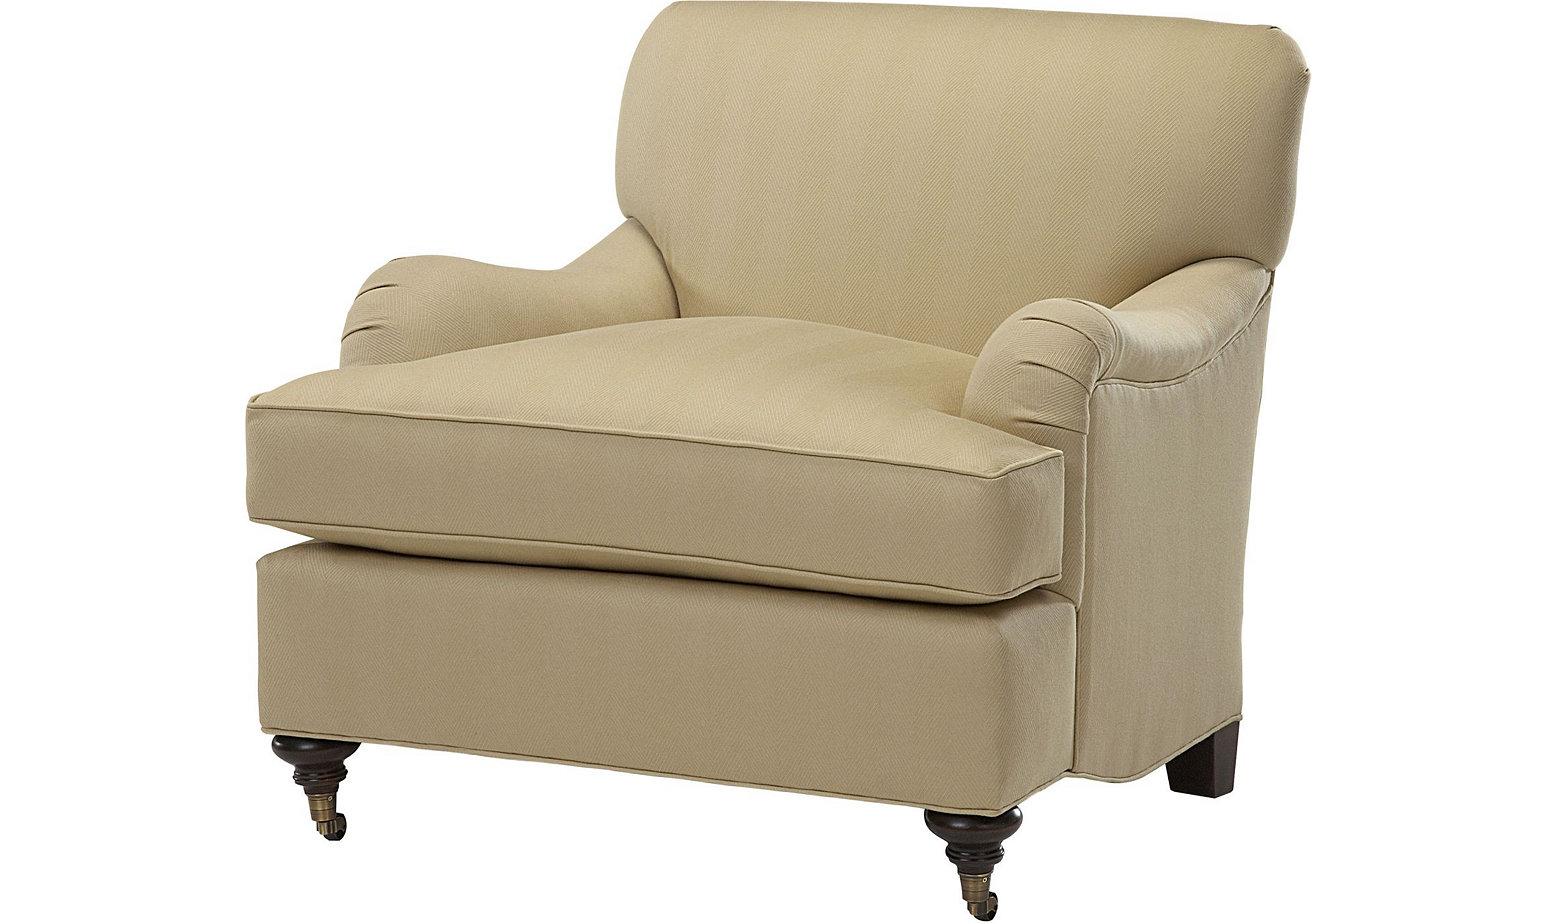 Awesome Baker English Arm Lounge Chair Flegels Home Furnishings Machost Co Dining Chair Design Ideas Machostcouk